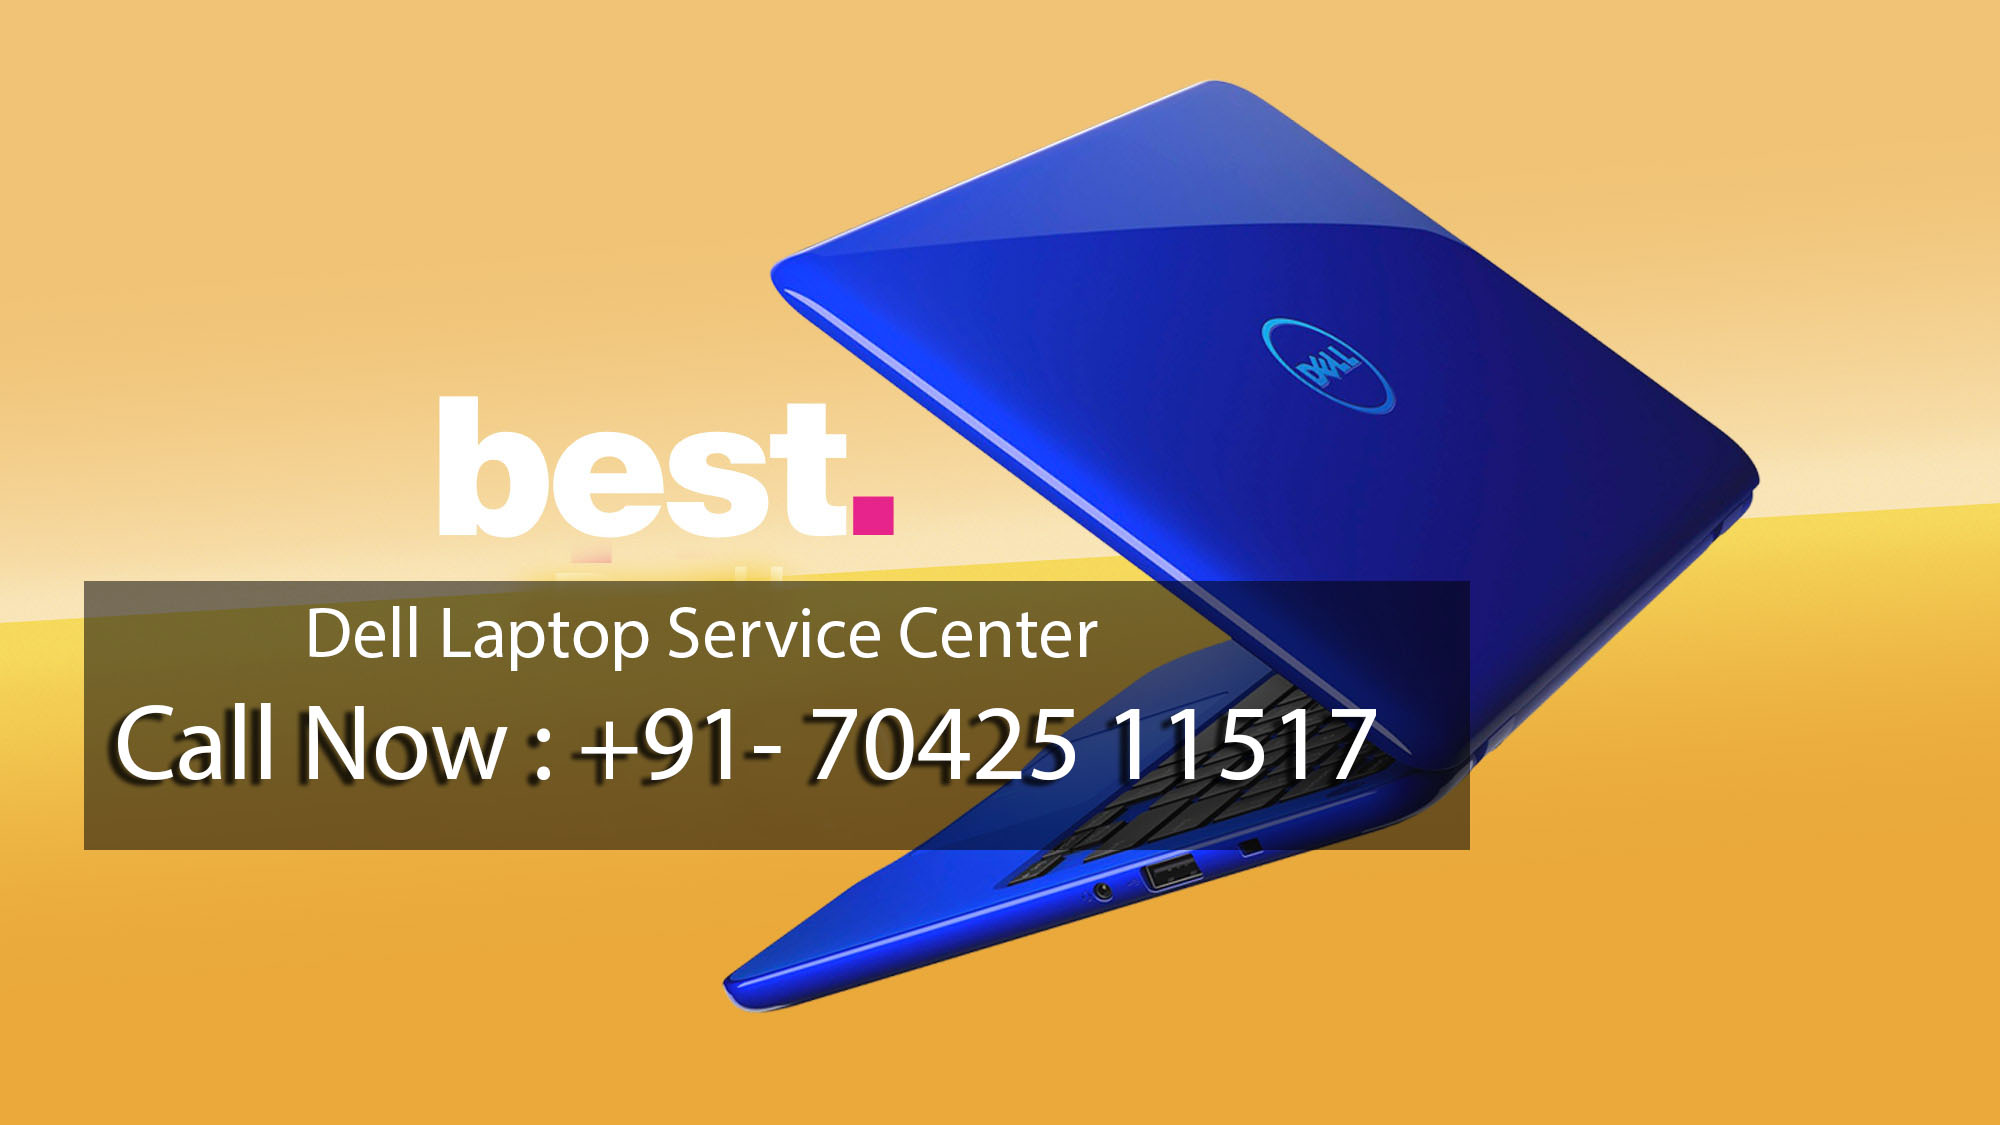 Dell Service Center in Kailash Nagar